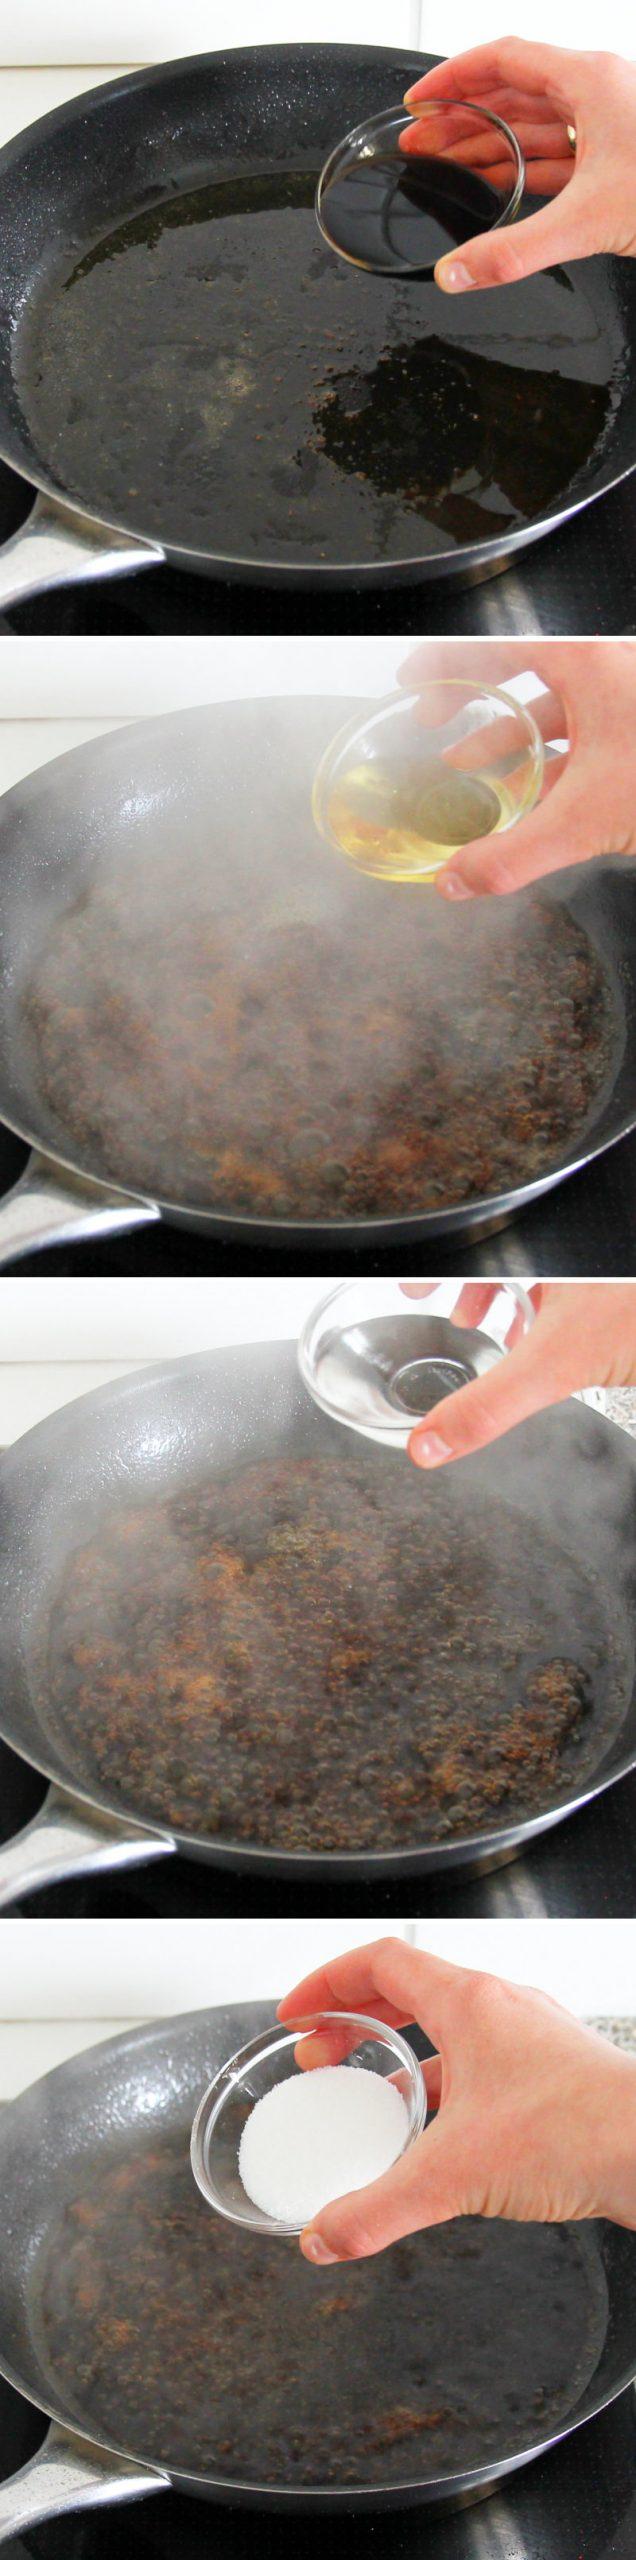 Teriyaki Chicken Wings Schritt 4 Sauce zubereiten